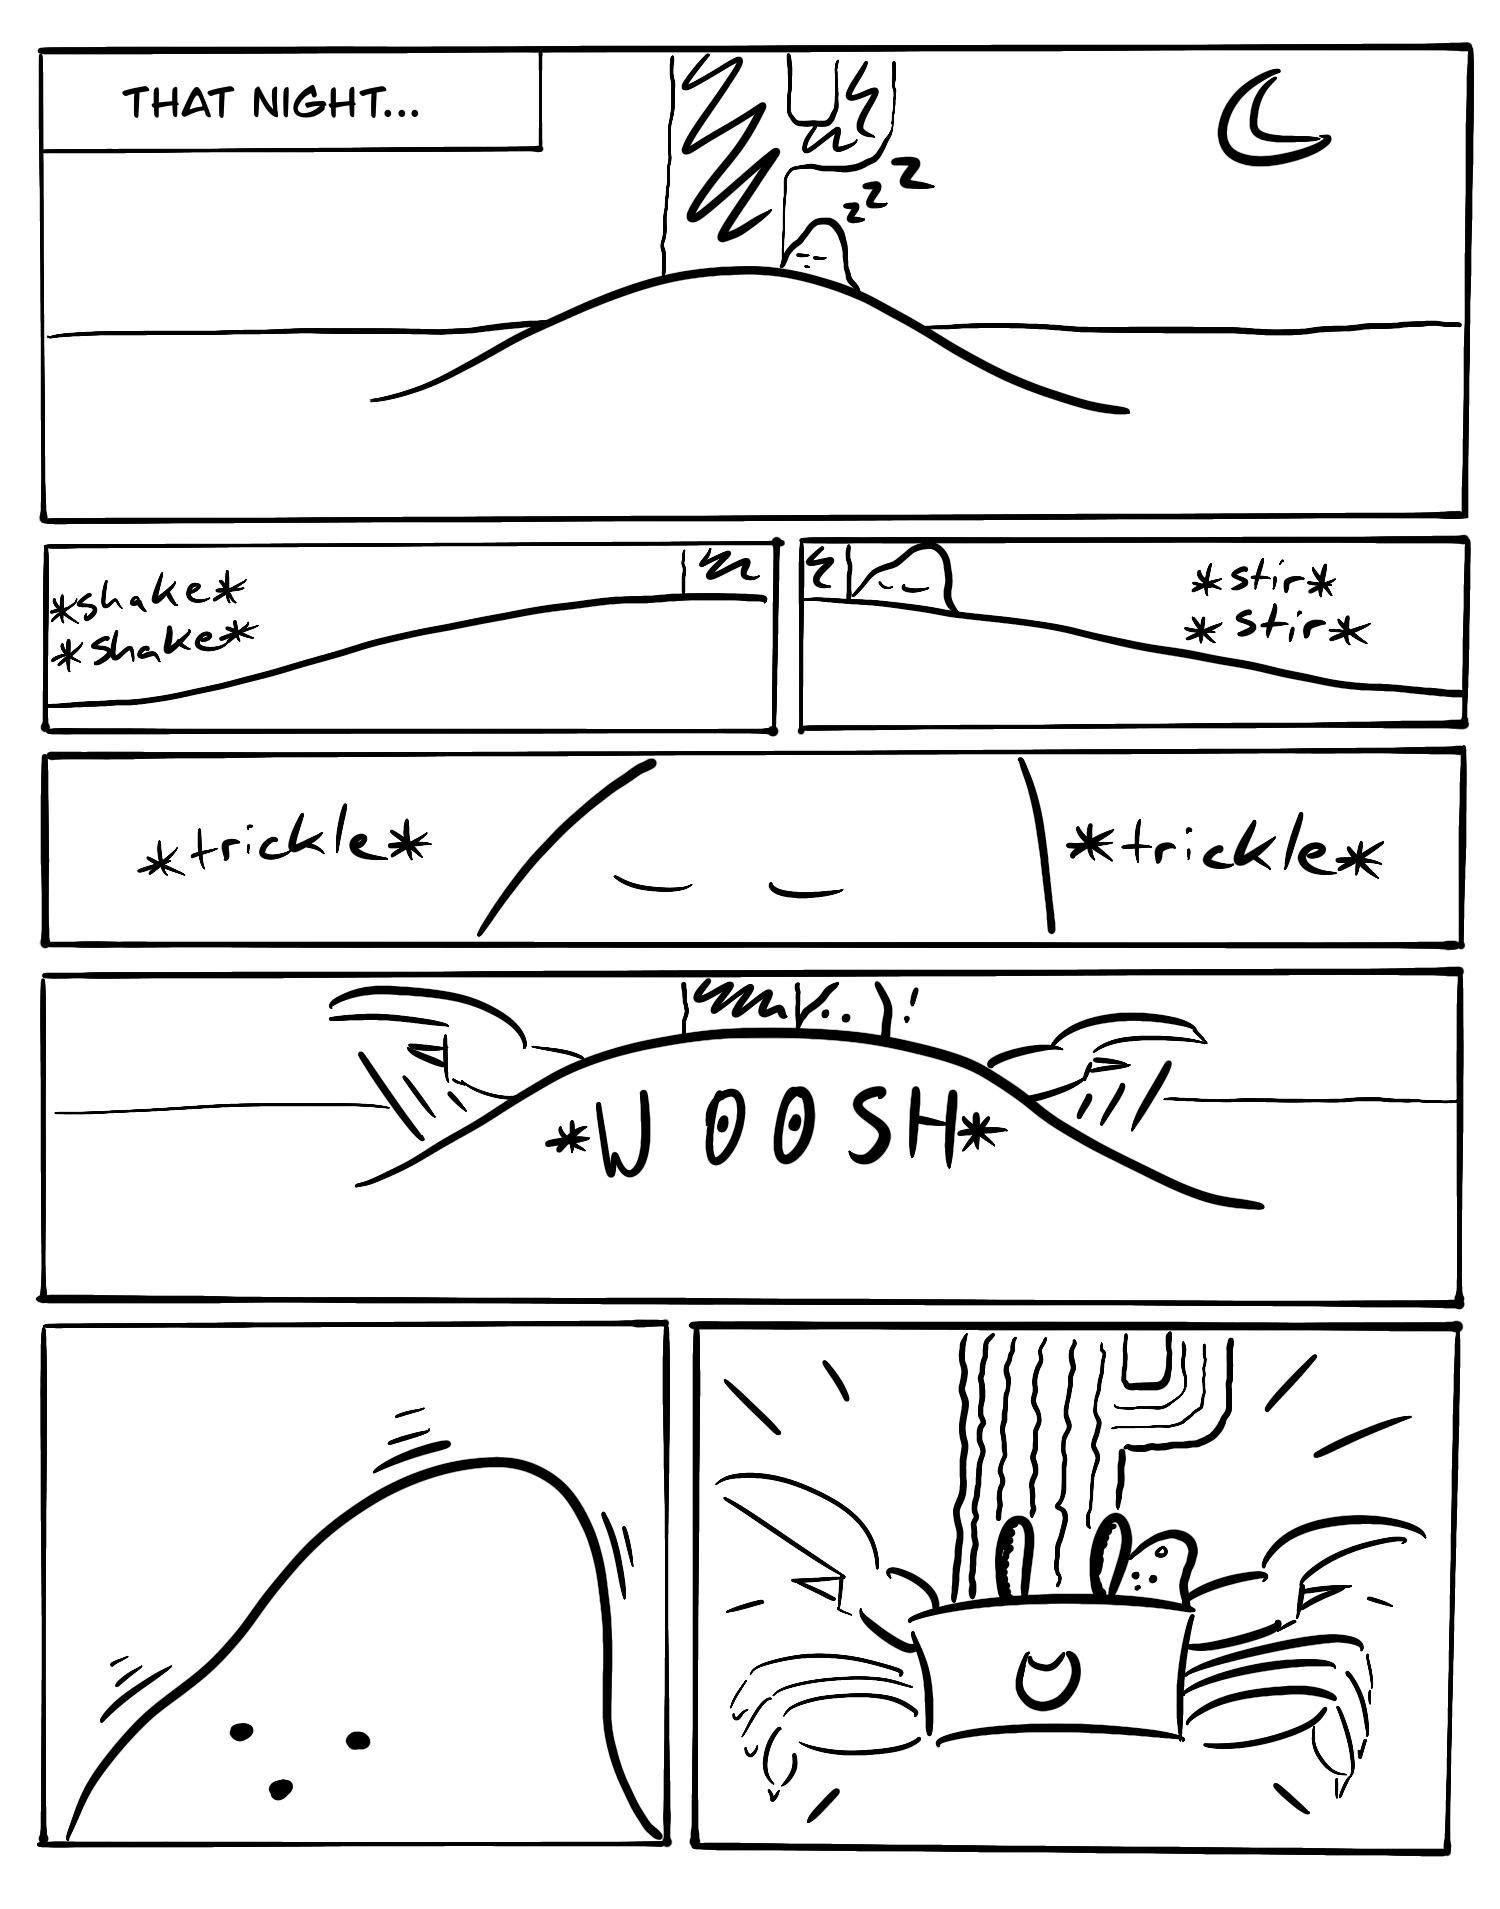 Comic_Digital_10.JPG